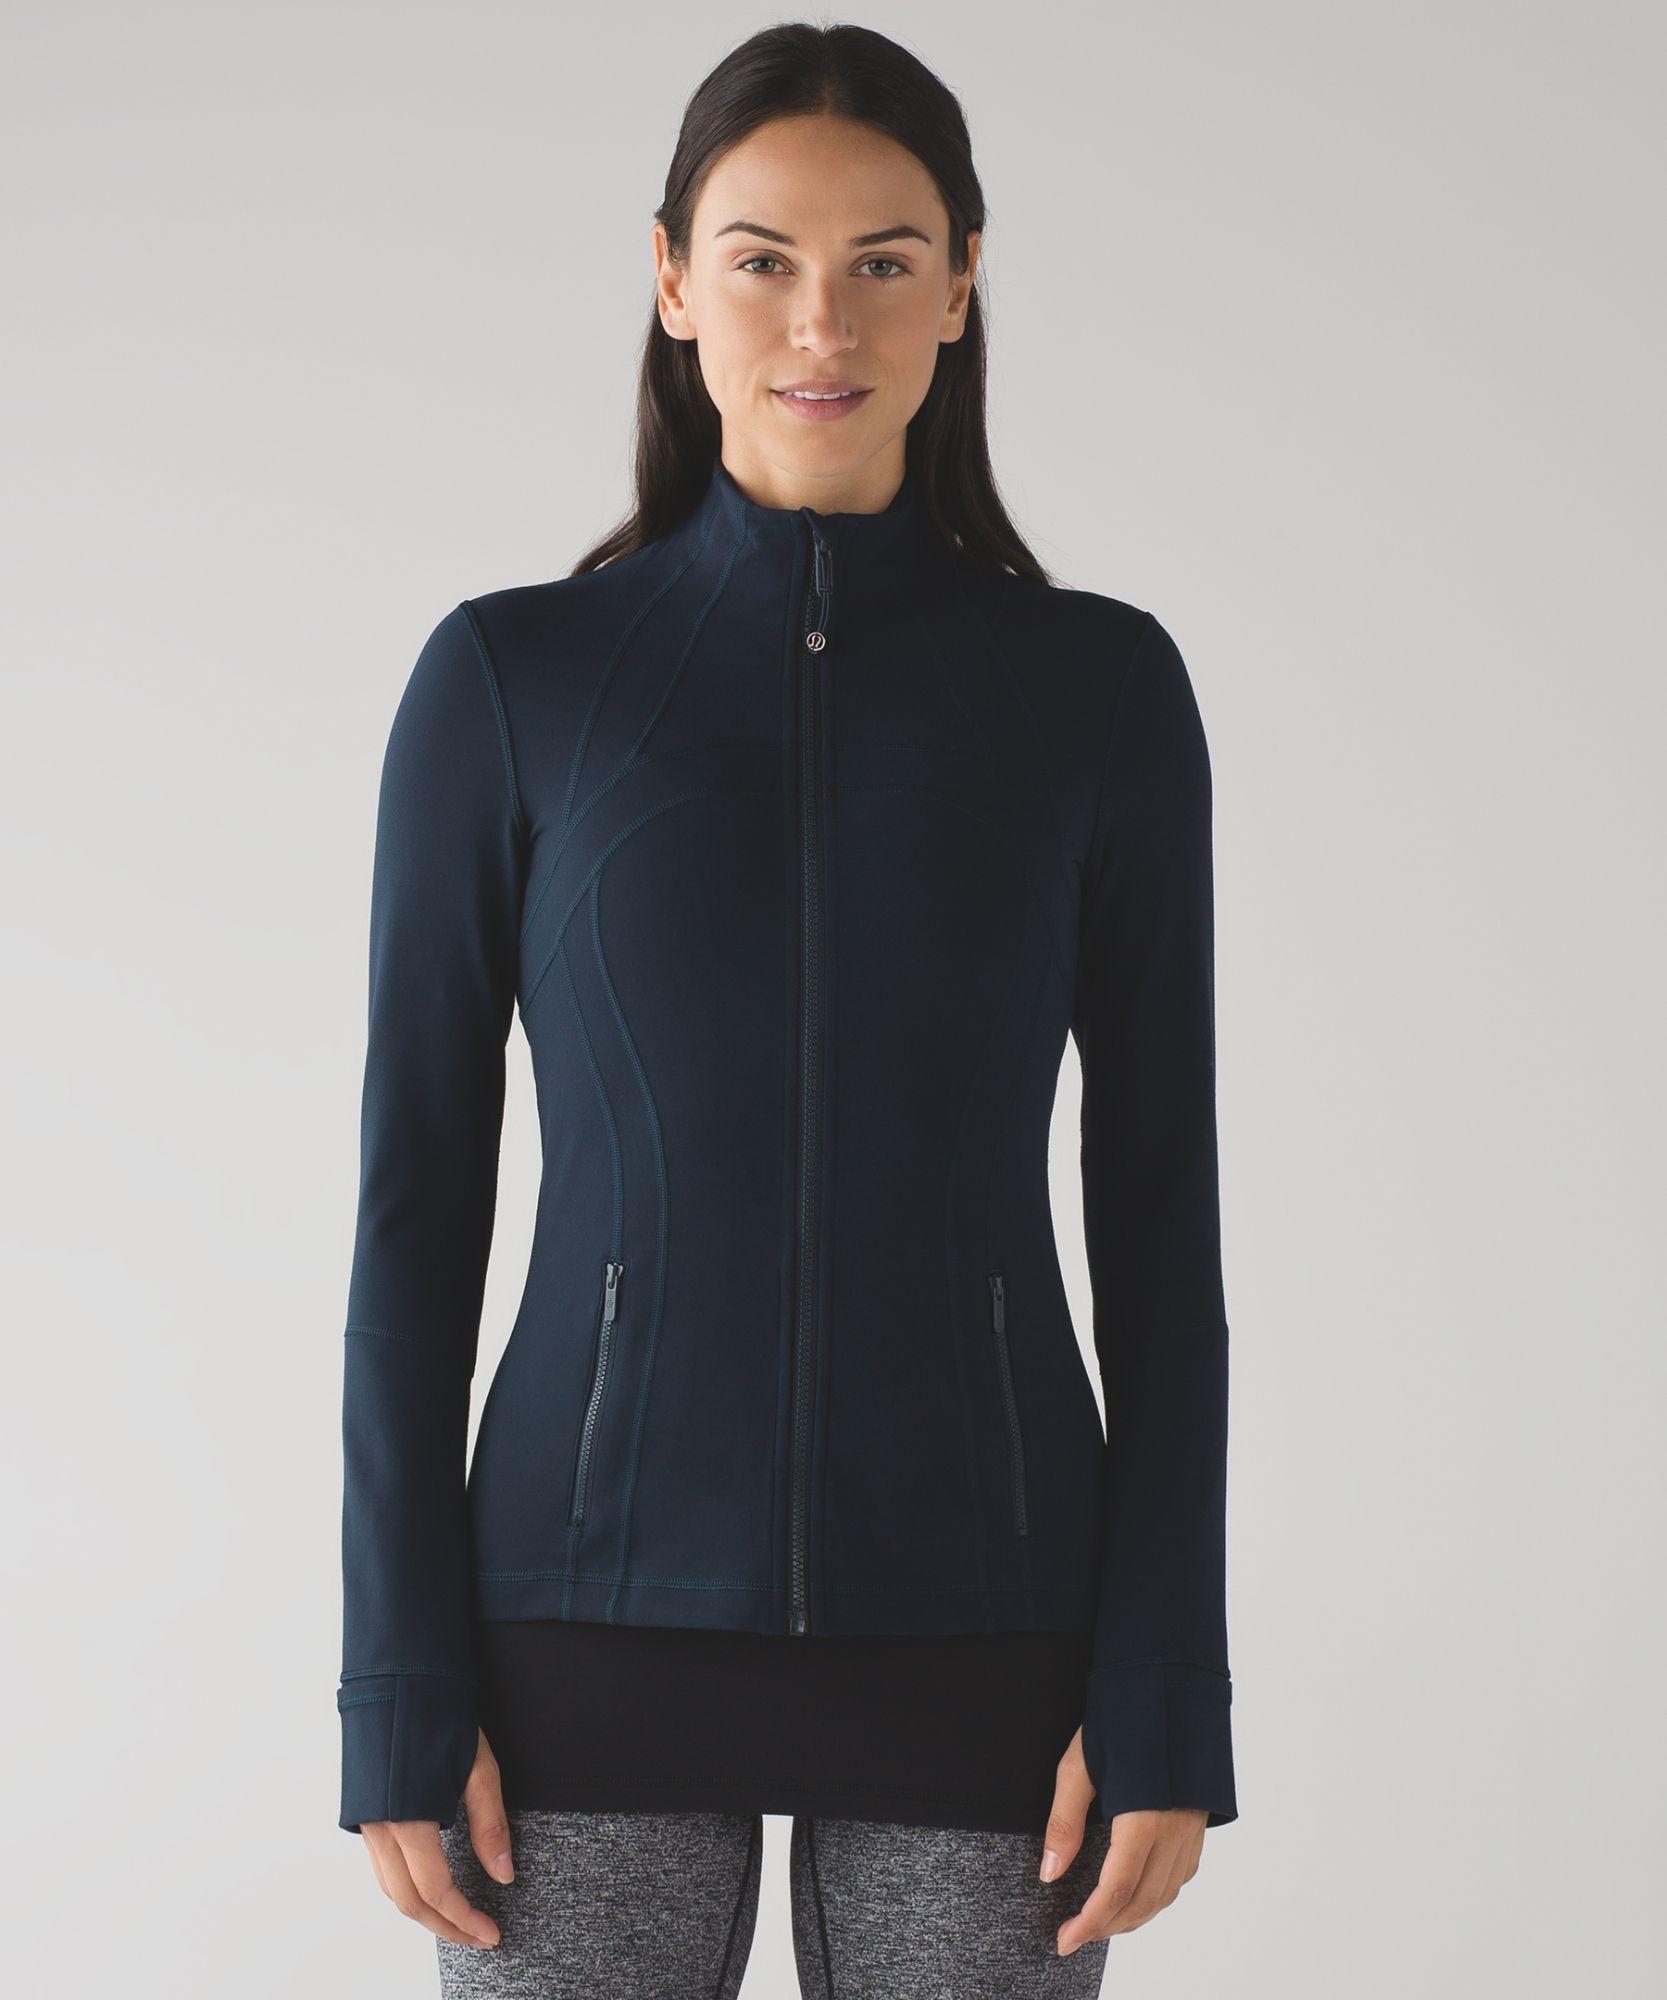 Define Jacket lululemon We designed this fitted jacket